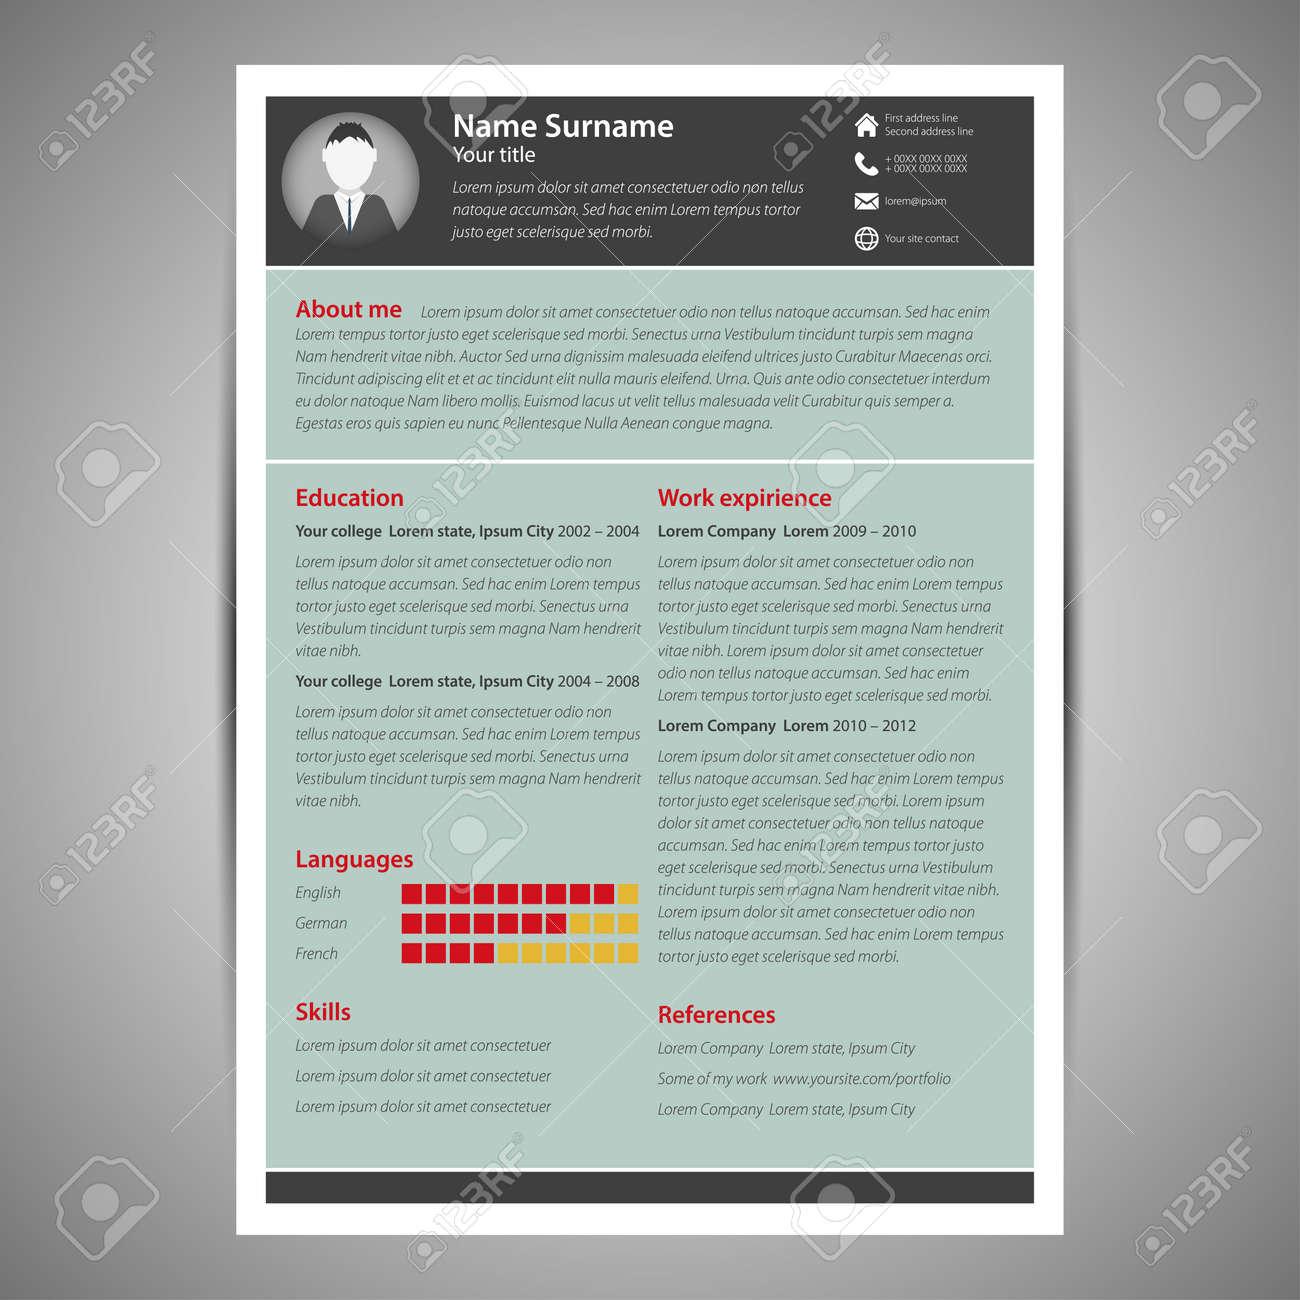 Recent Posts flat resume design Idealvistalistco